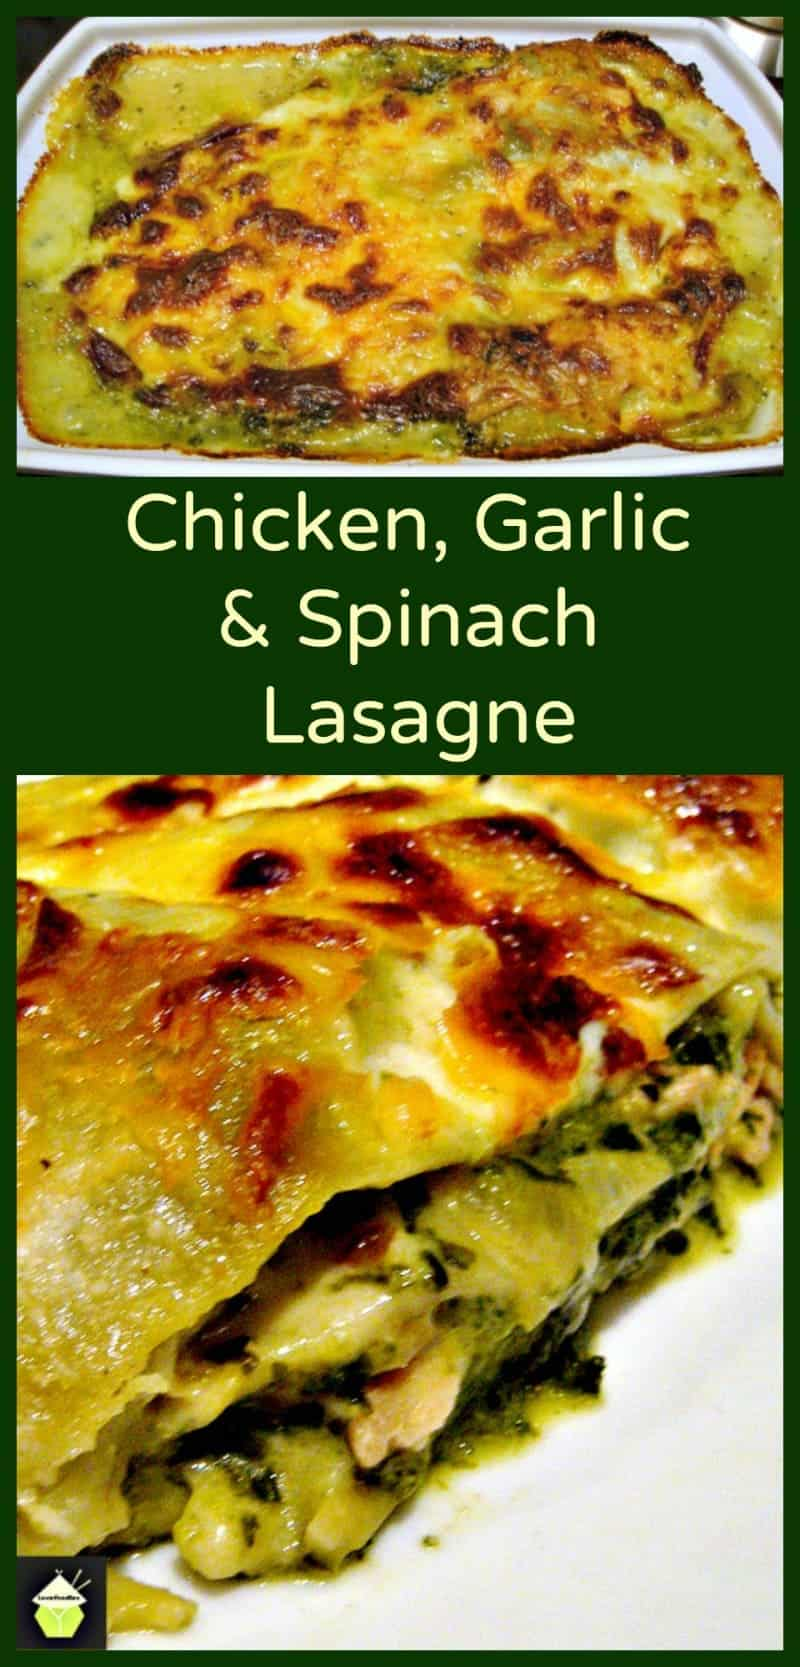 Chicken garlic and spinach lasagna lovefoodies for Spinach chicken lasagna recipe